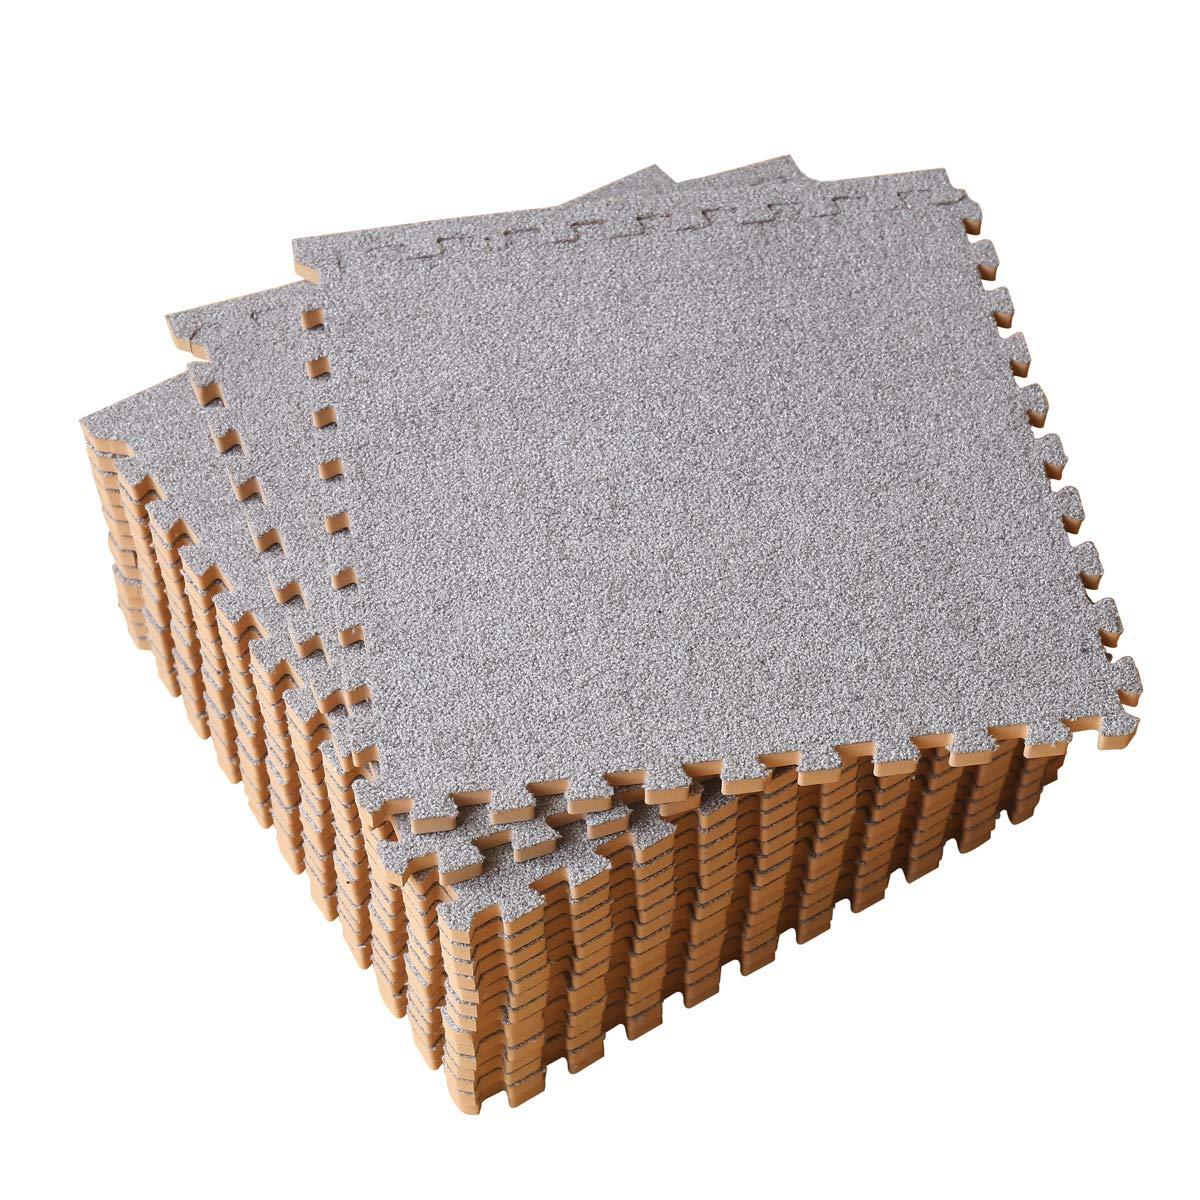 LaFamille Interlocking Foam Floor Mat 16 Tiles 16 sq.ft Puzzle Carpet Flooring Exercise Square Mats Gym,Playroom Floor Mats for Carpet 1'x1' (Light Gray)